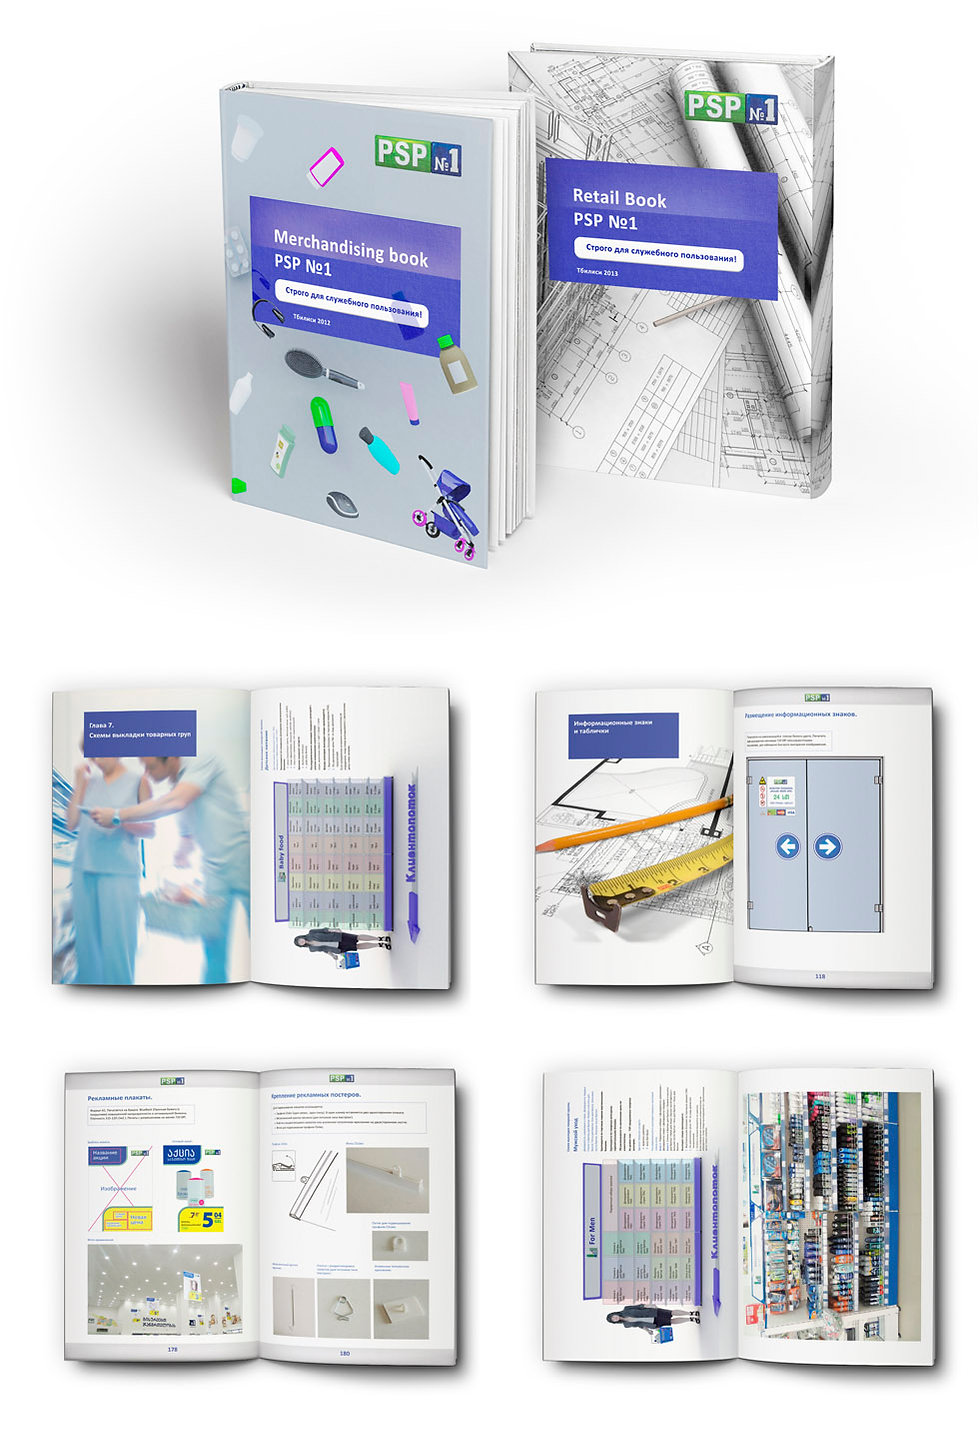 psp merchandising book